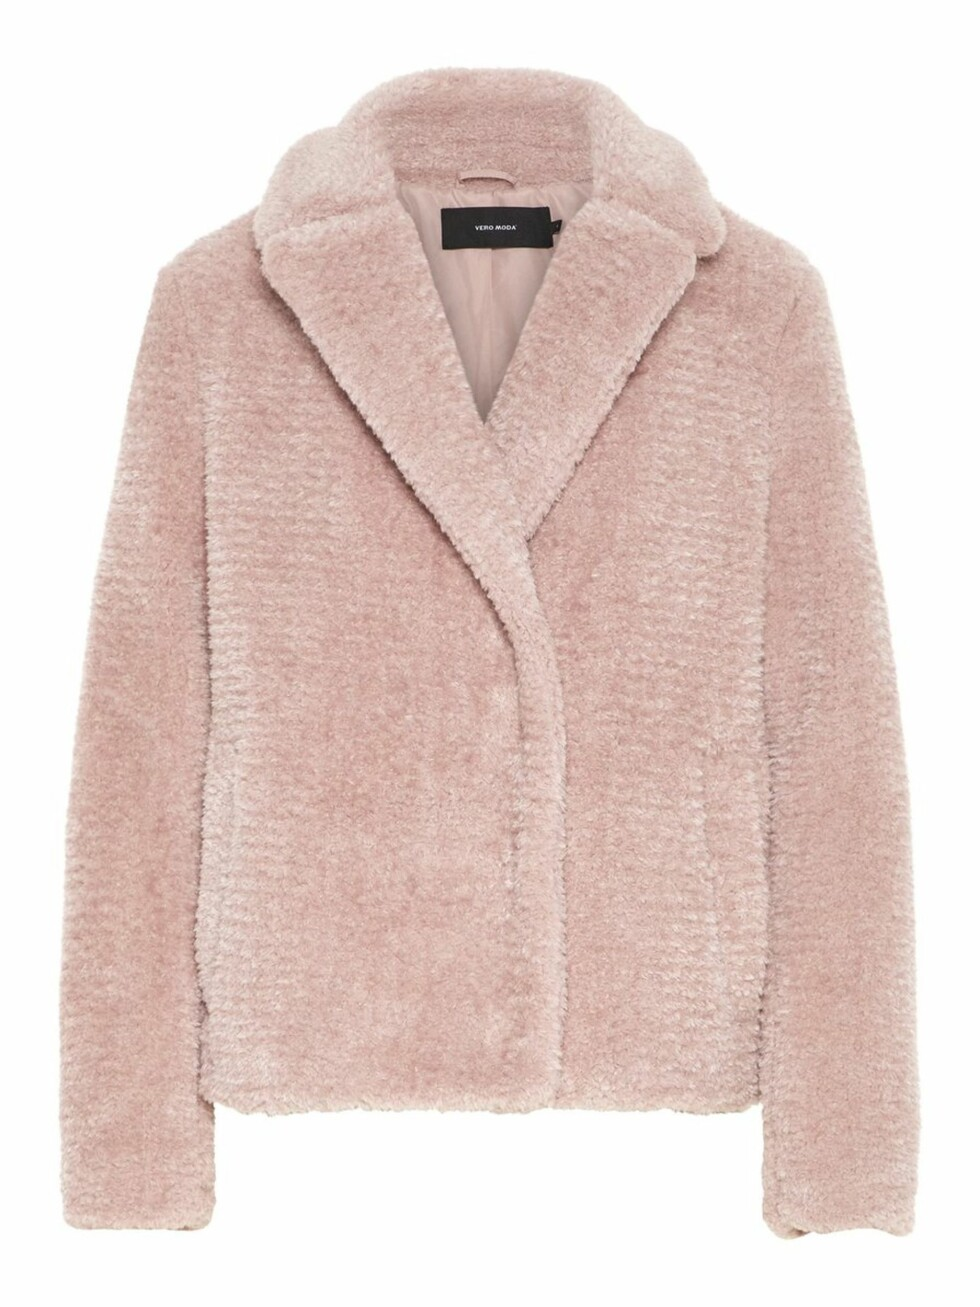 Fuskepels fra Vero Moda |700,-| https://www.veromoda.com/no/no/vm/kjoep-etter-kategori/jakker/faux-fur-jakke-10206356.html?cgid=vm-jackets&dwvar_colorPattern=10206356_MistyRose